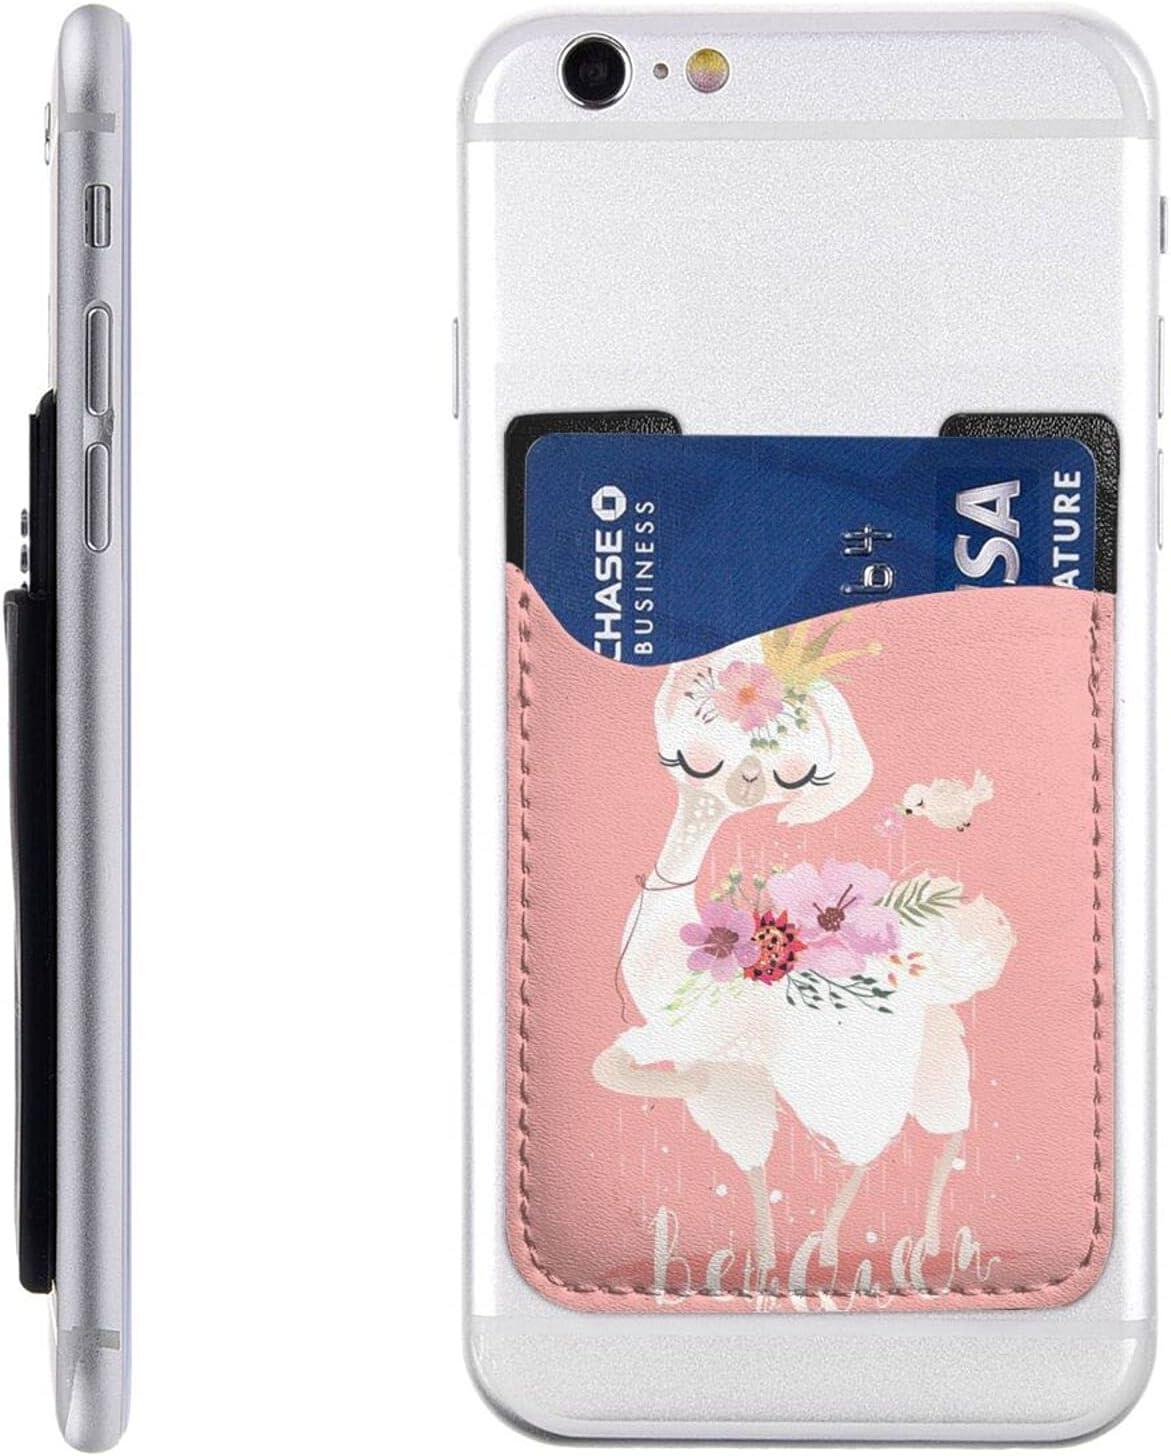 Beautiful Cute Llama Manufacturer regenerated product Alpaca Animal Cell Card Phone Holder Houston Mall